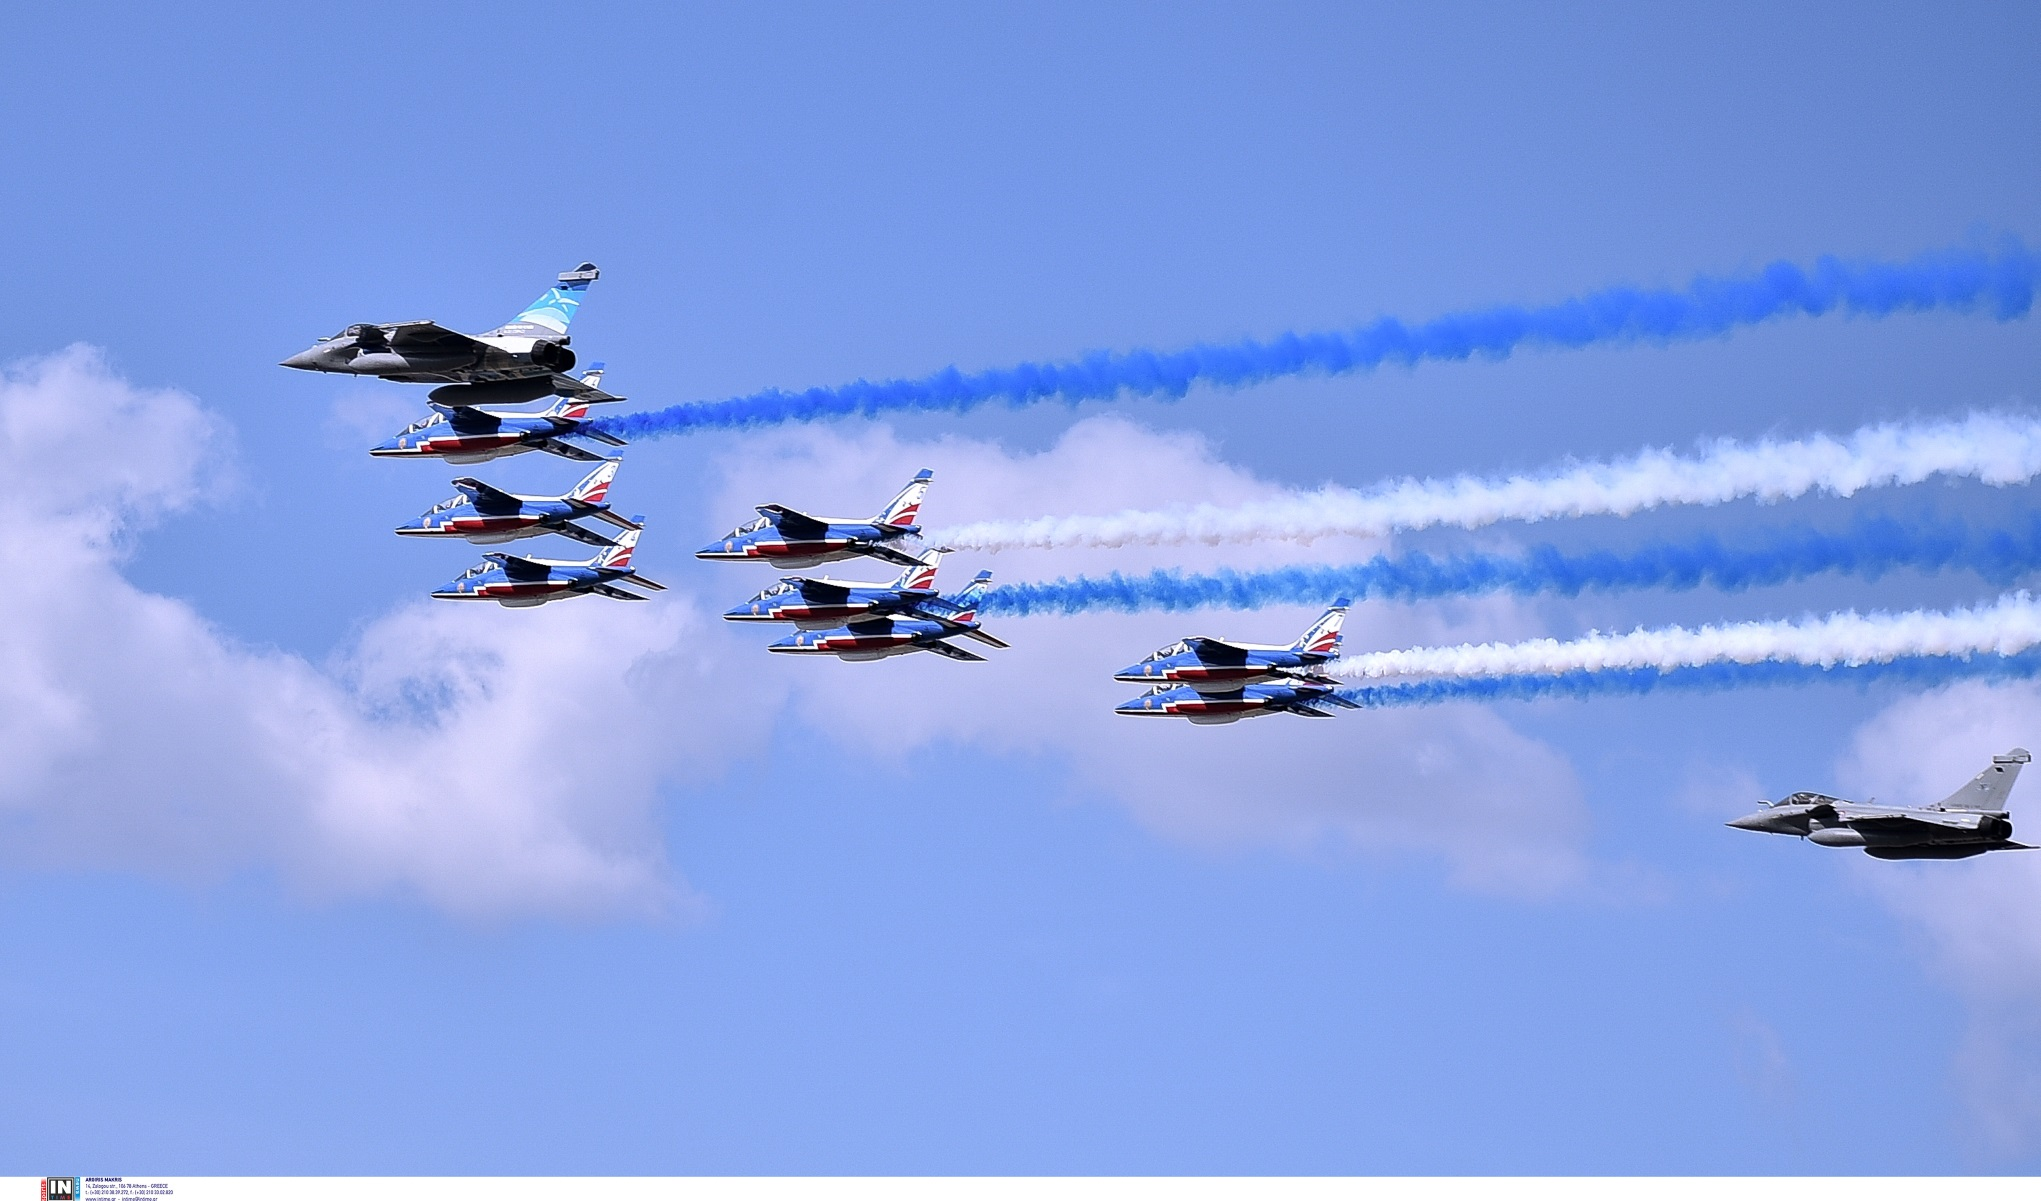 Rafale – Φλοράνς Παρλί: Συγχαρητήρια μετά την ανακοίνωση Μητσοτάκη για αγορά άλλων 6 μαχητικών